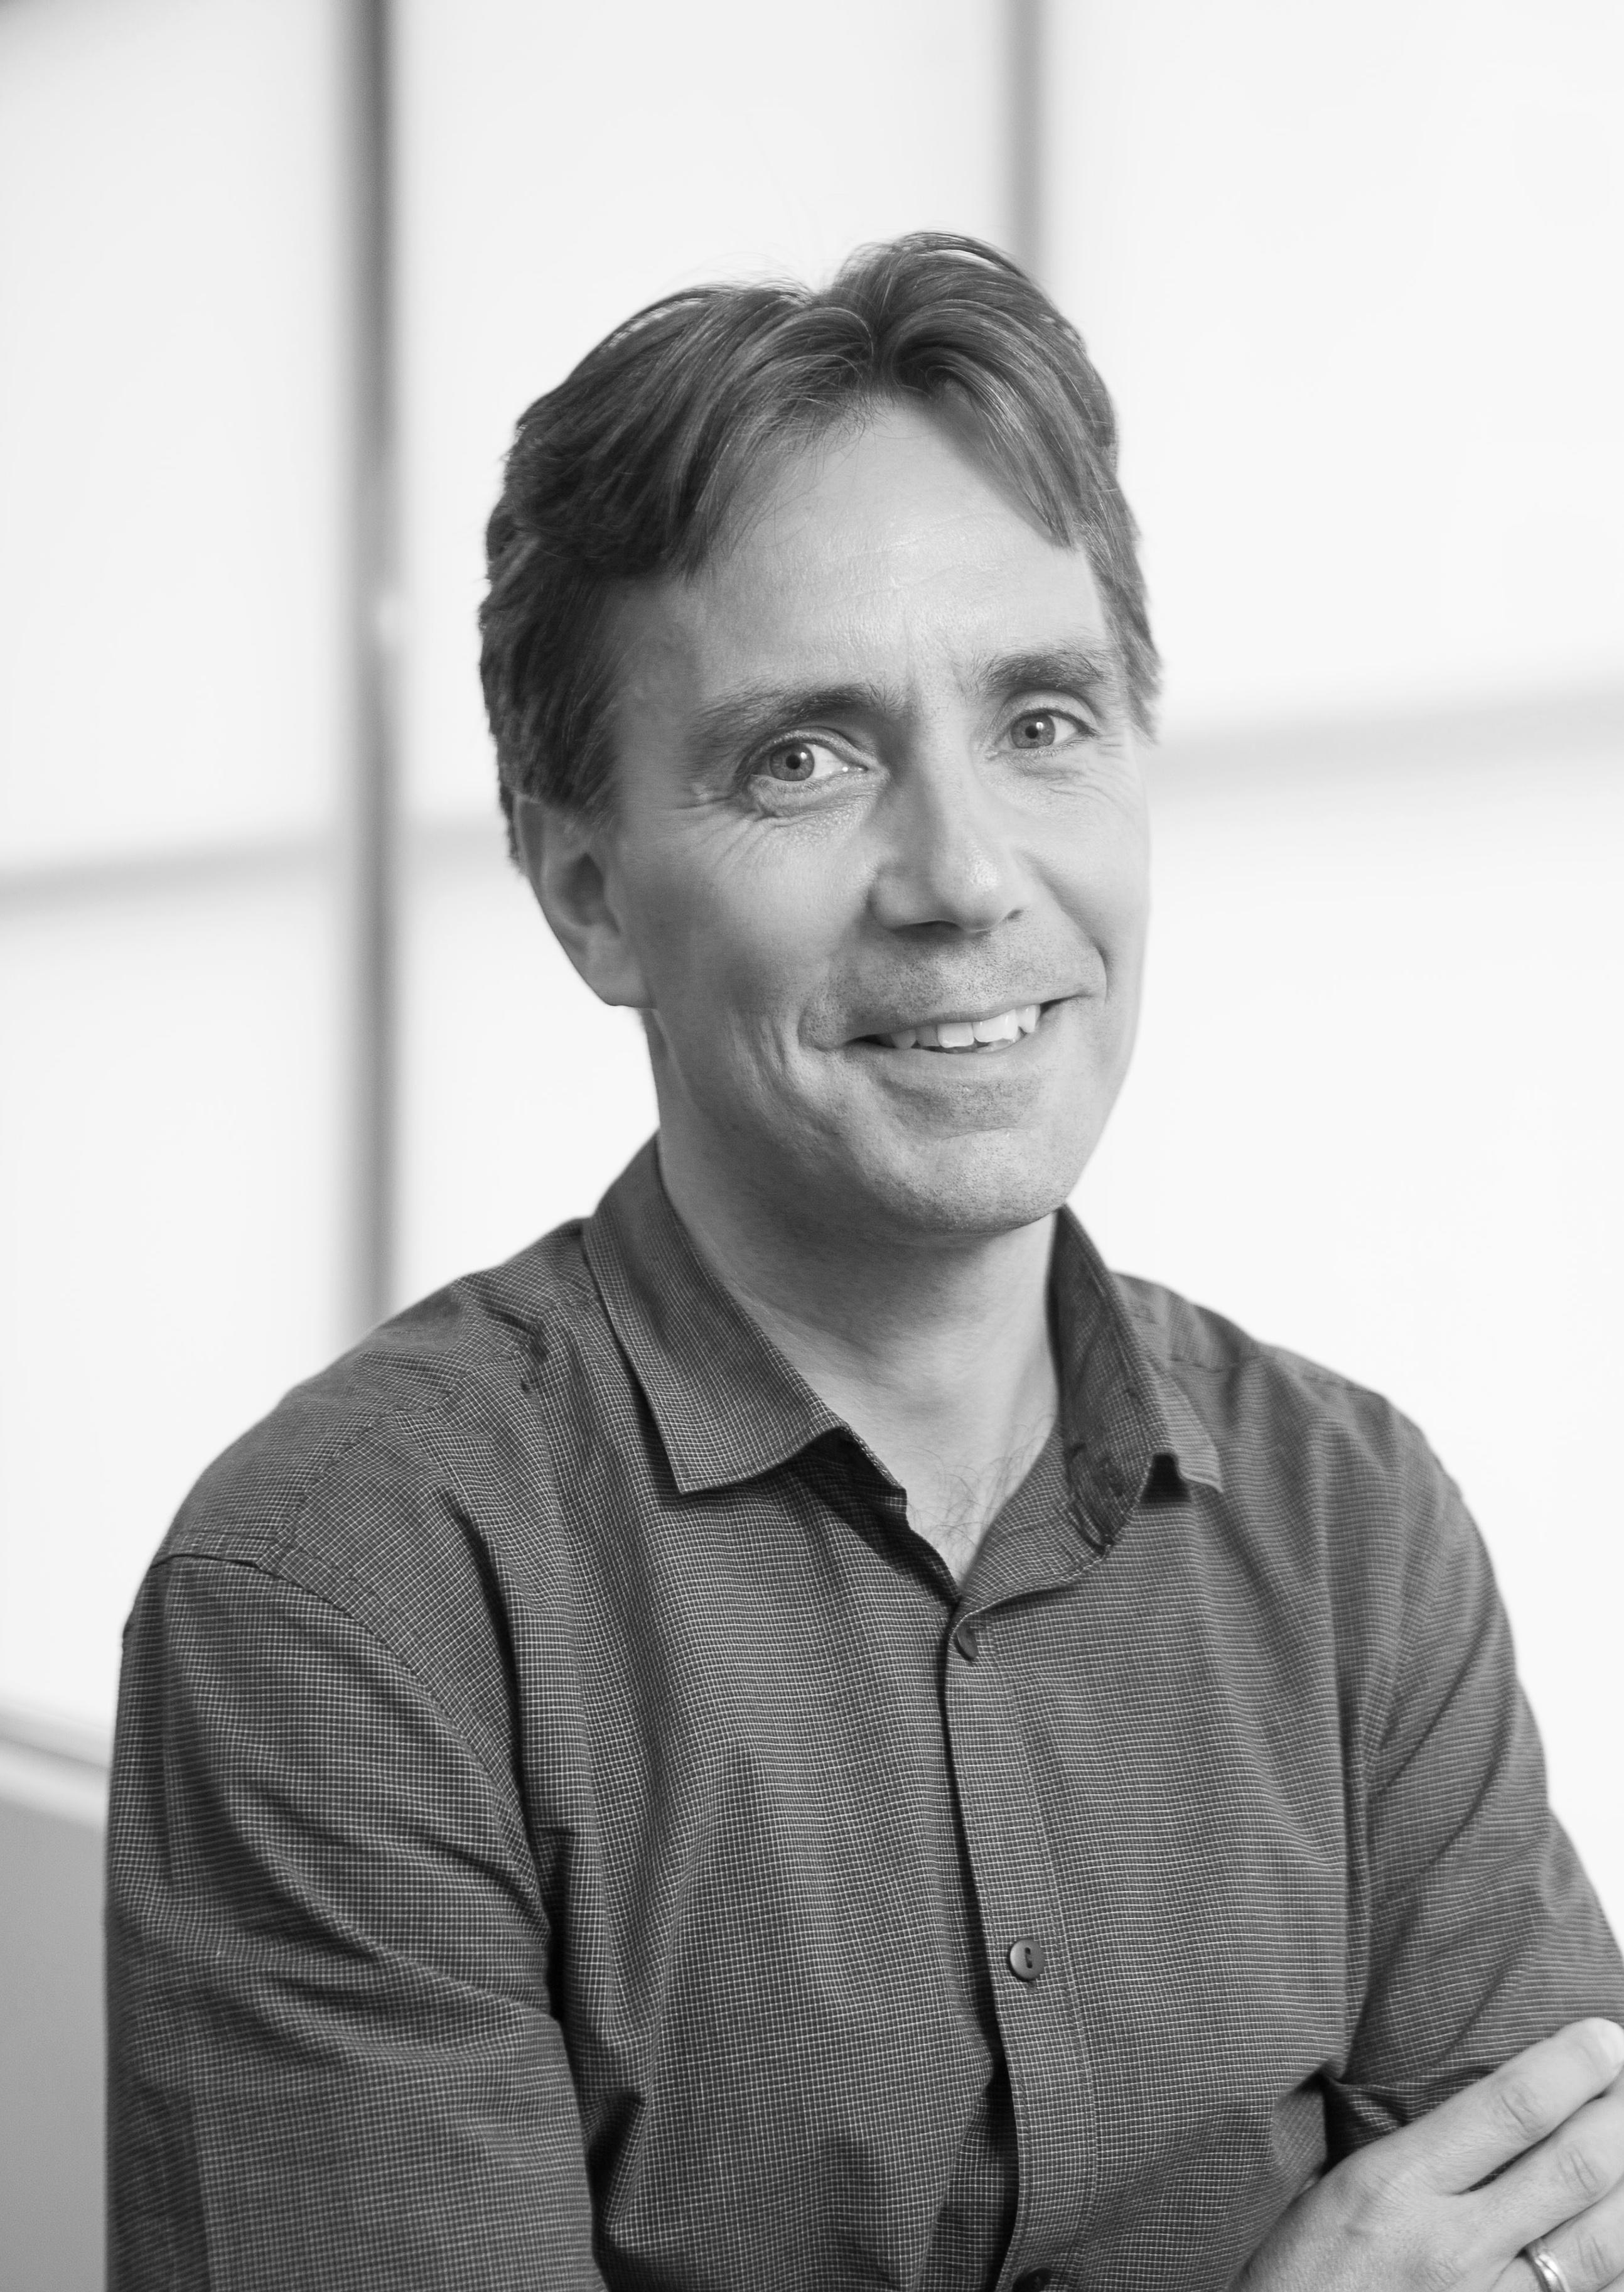 Henrik Klausen